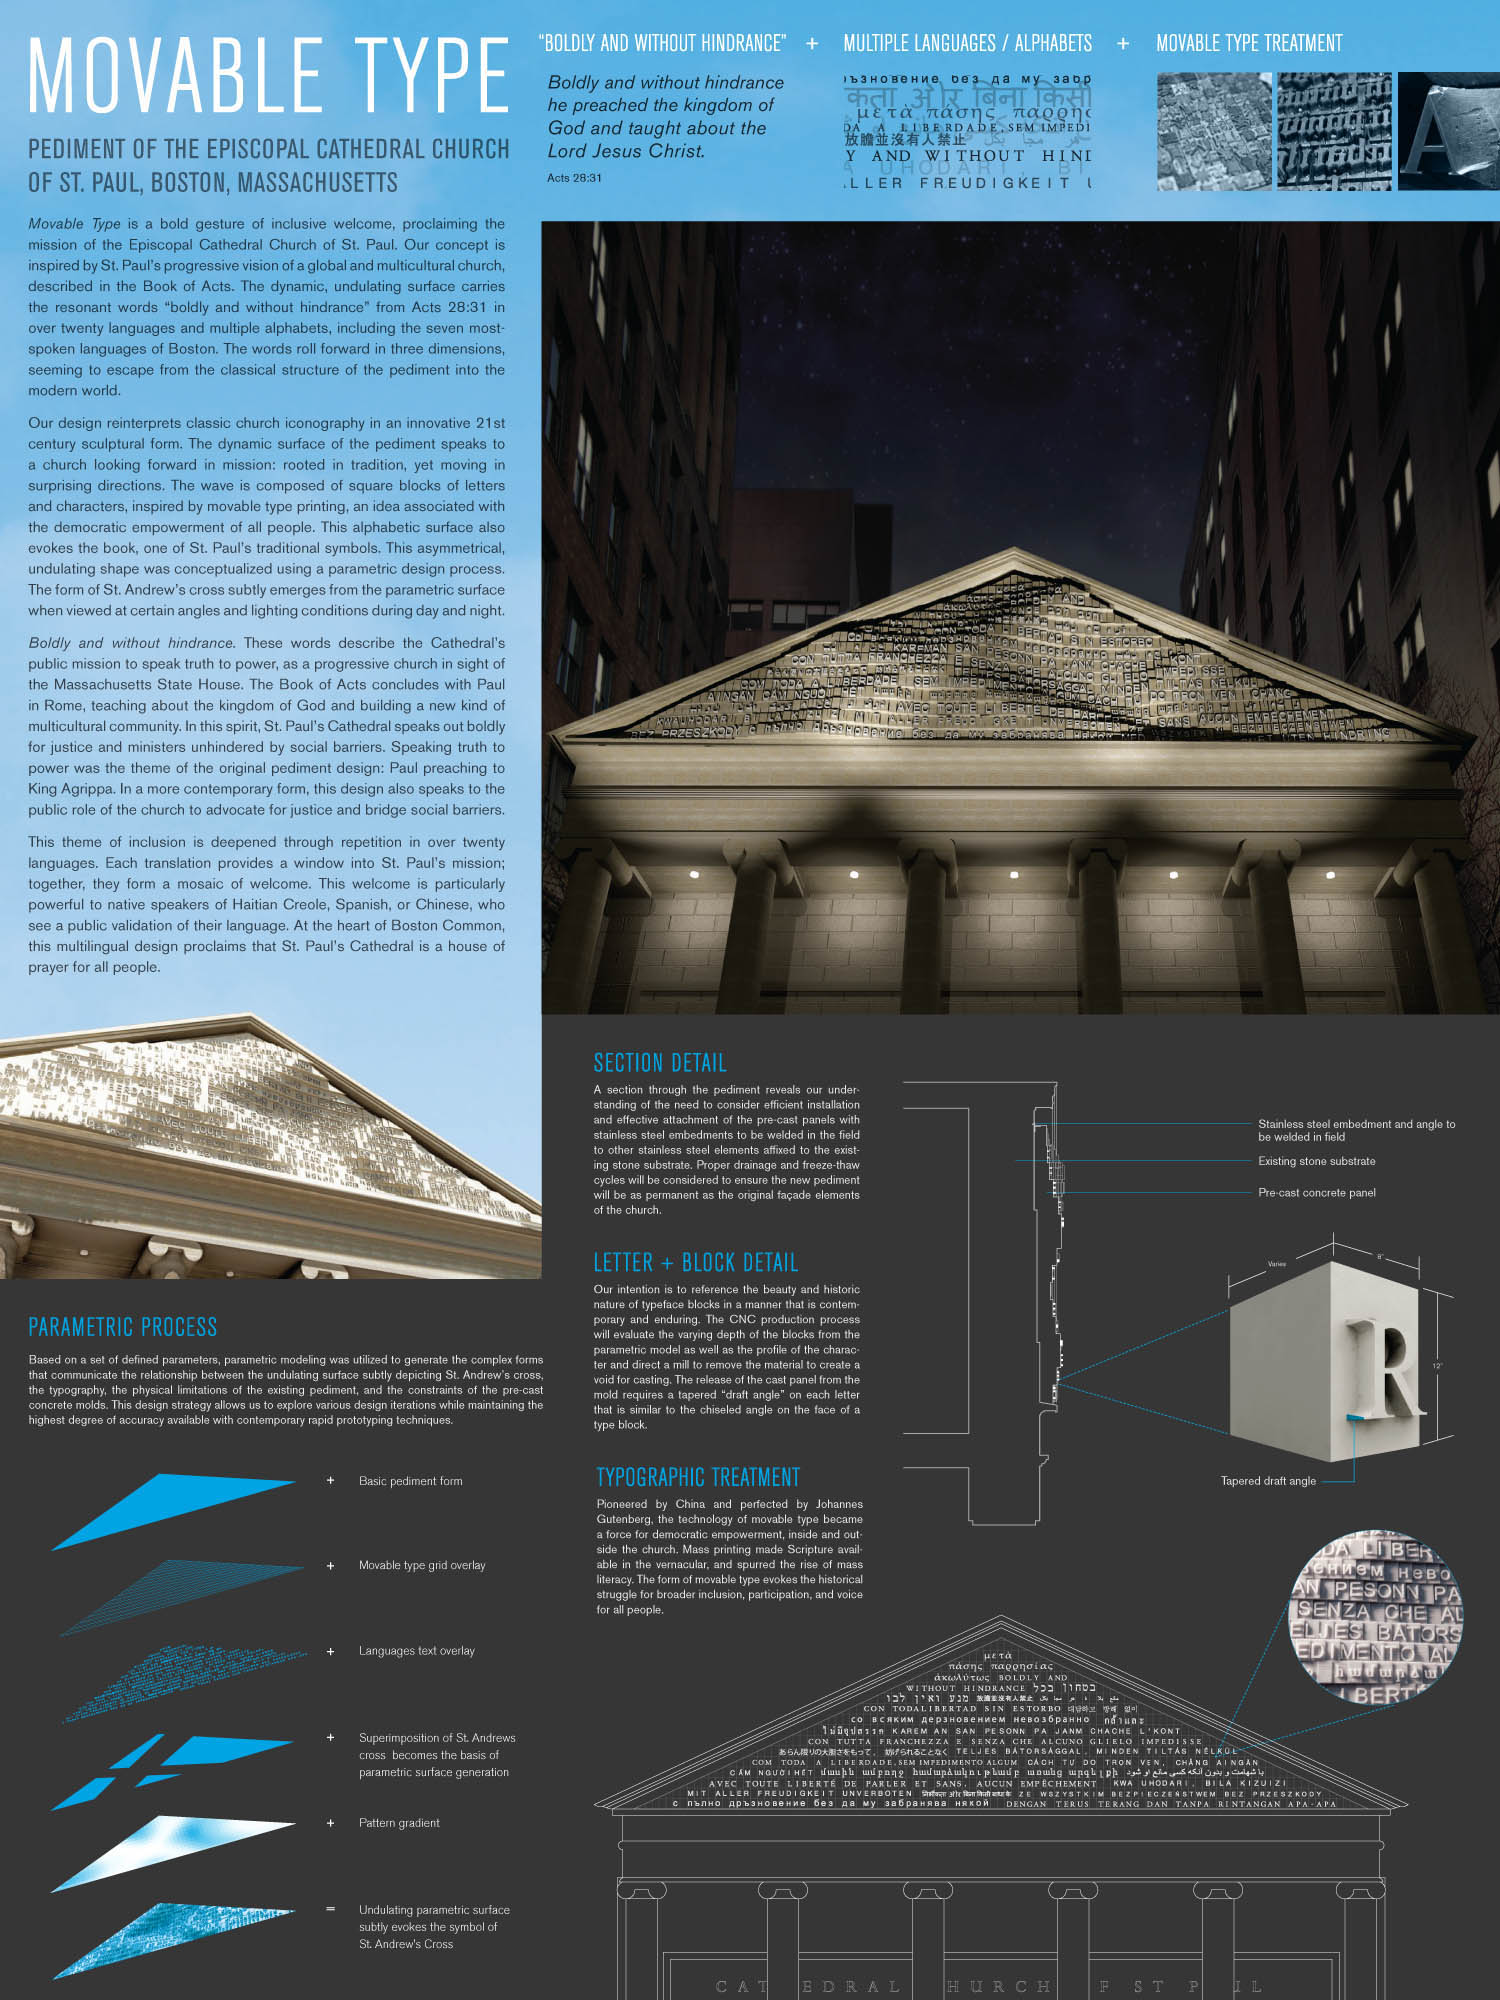 StPaul_Pediment_Proposal.jpg